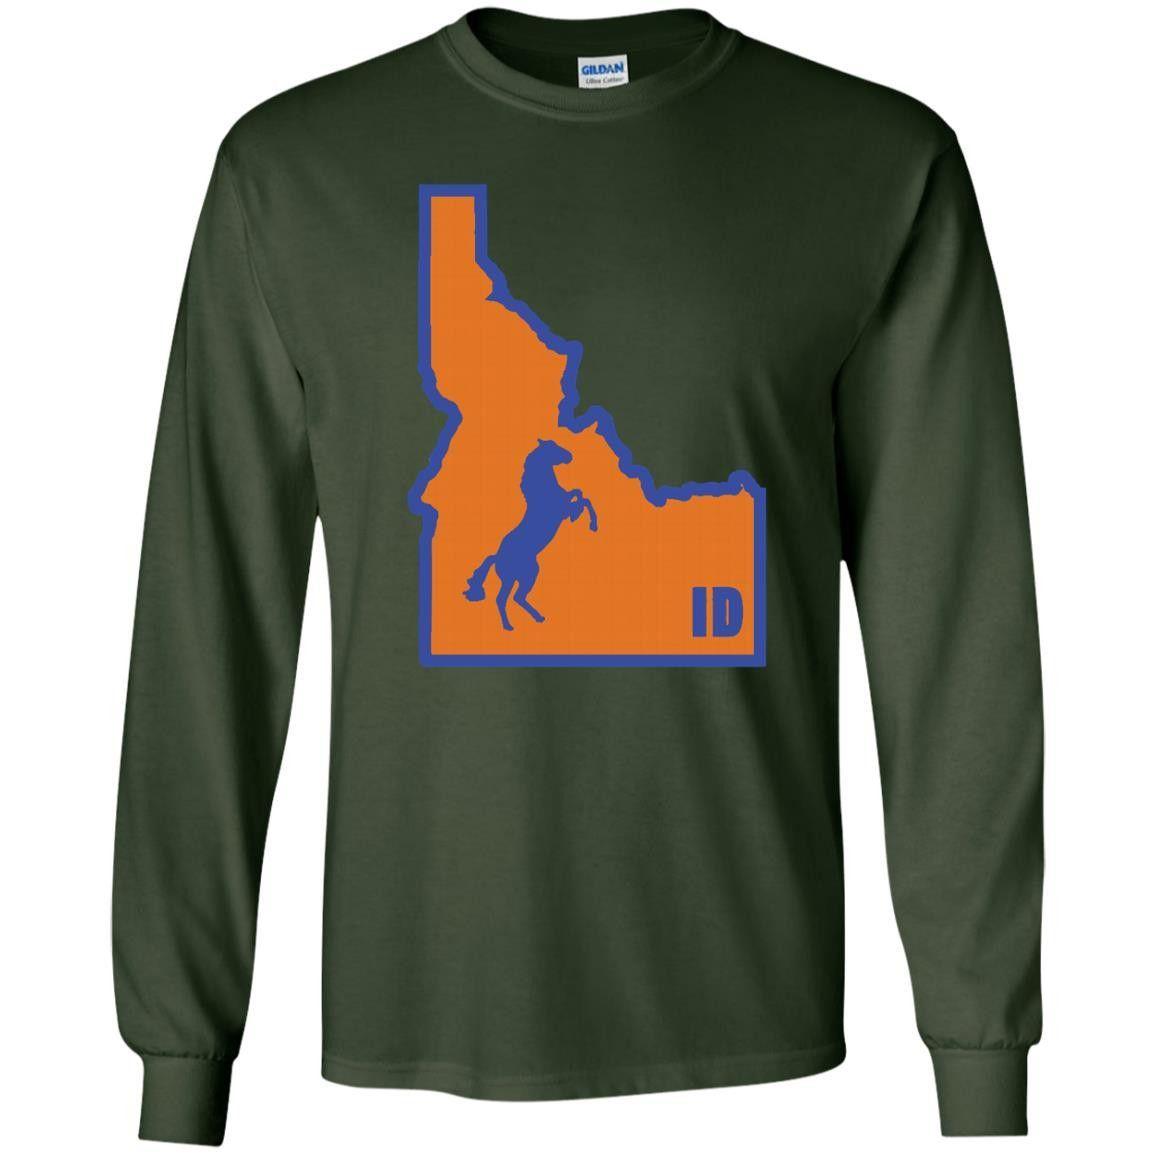 I Bronco Idaho Variant Classic University Vinyl G240 Gildan LS Ultra Cotton T-Shirt